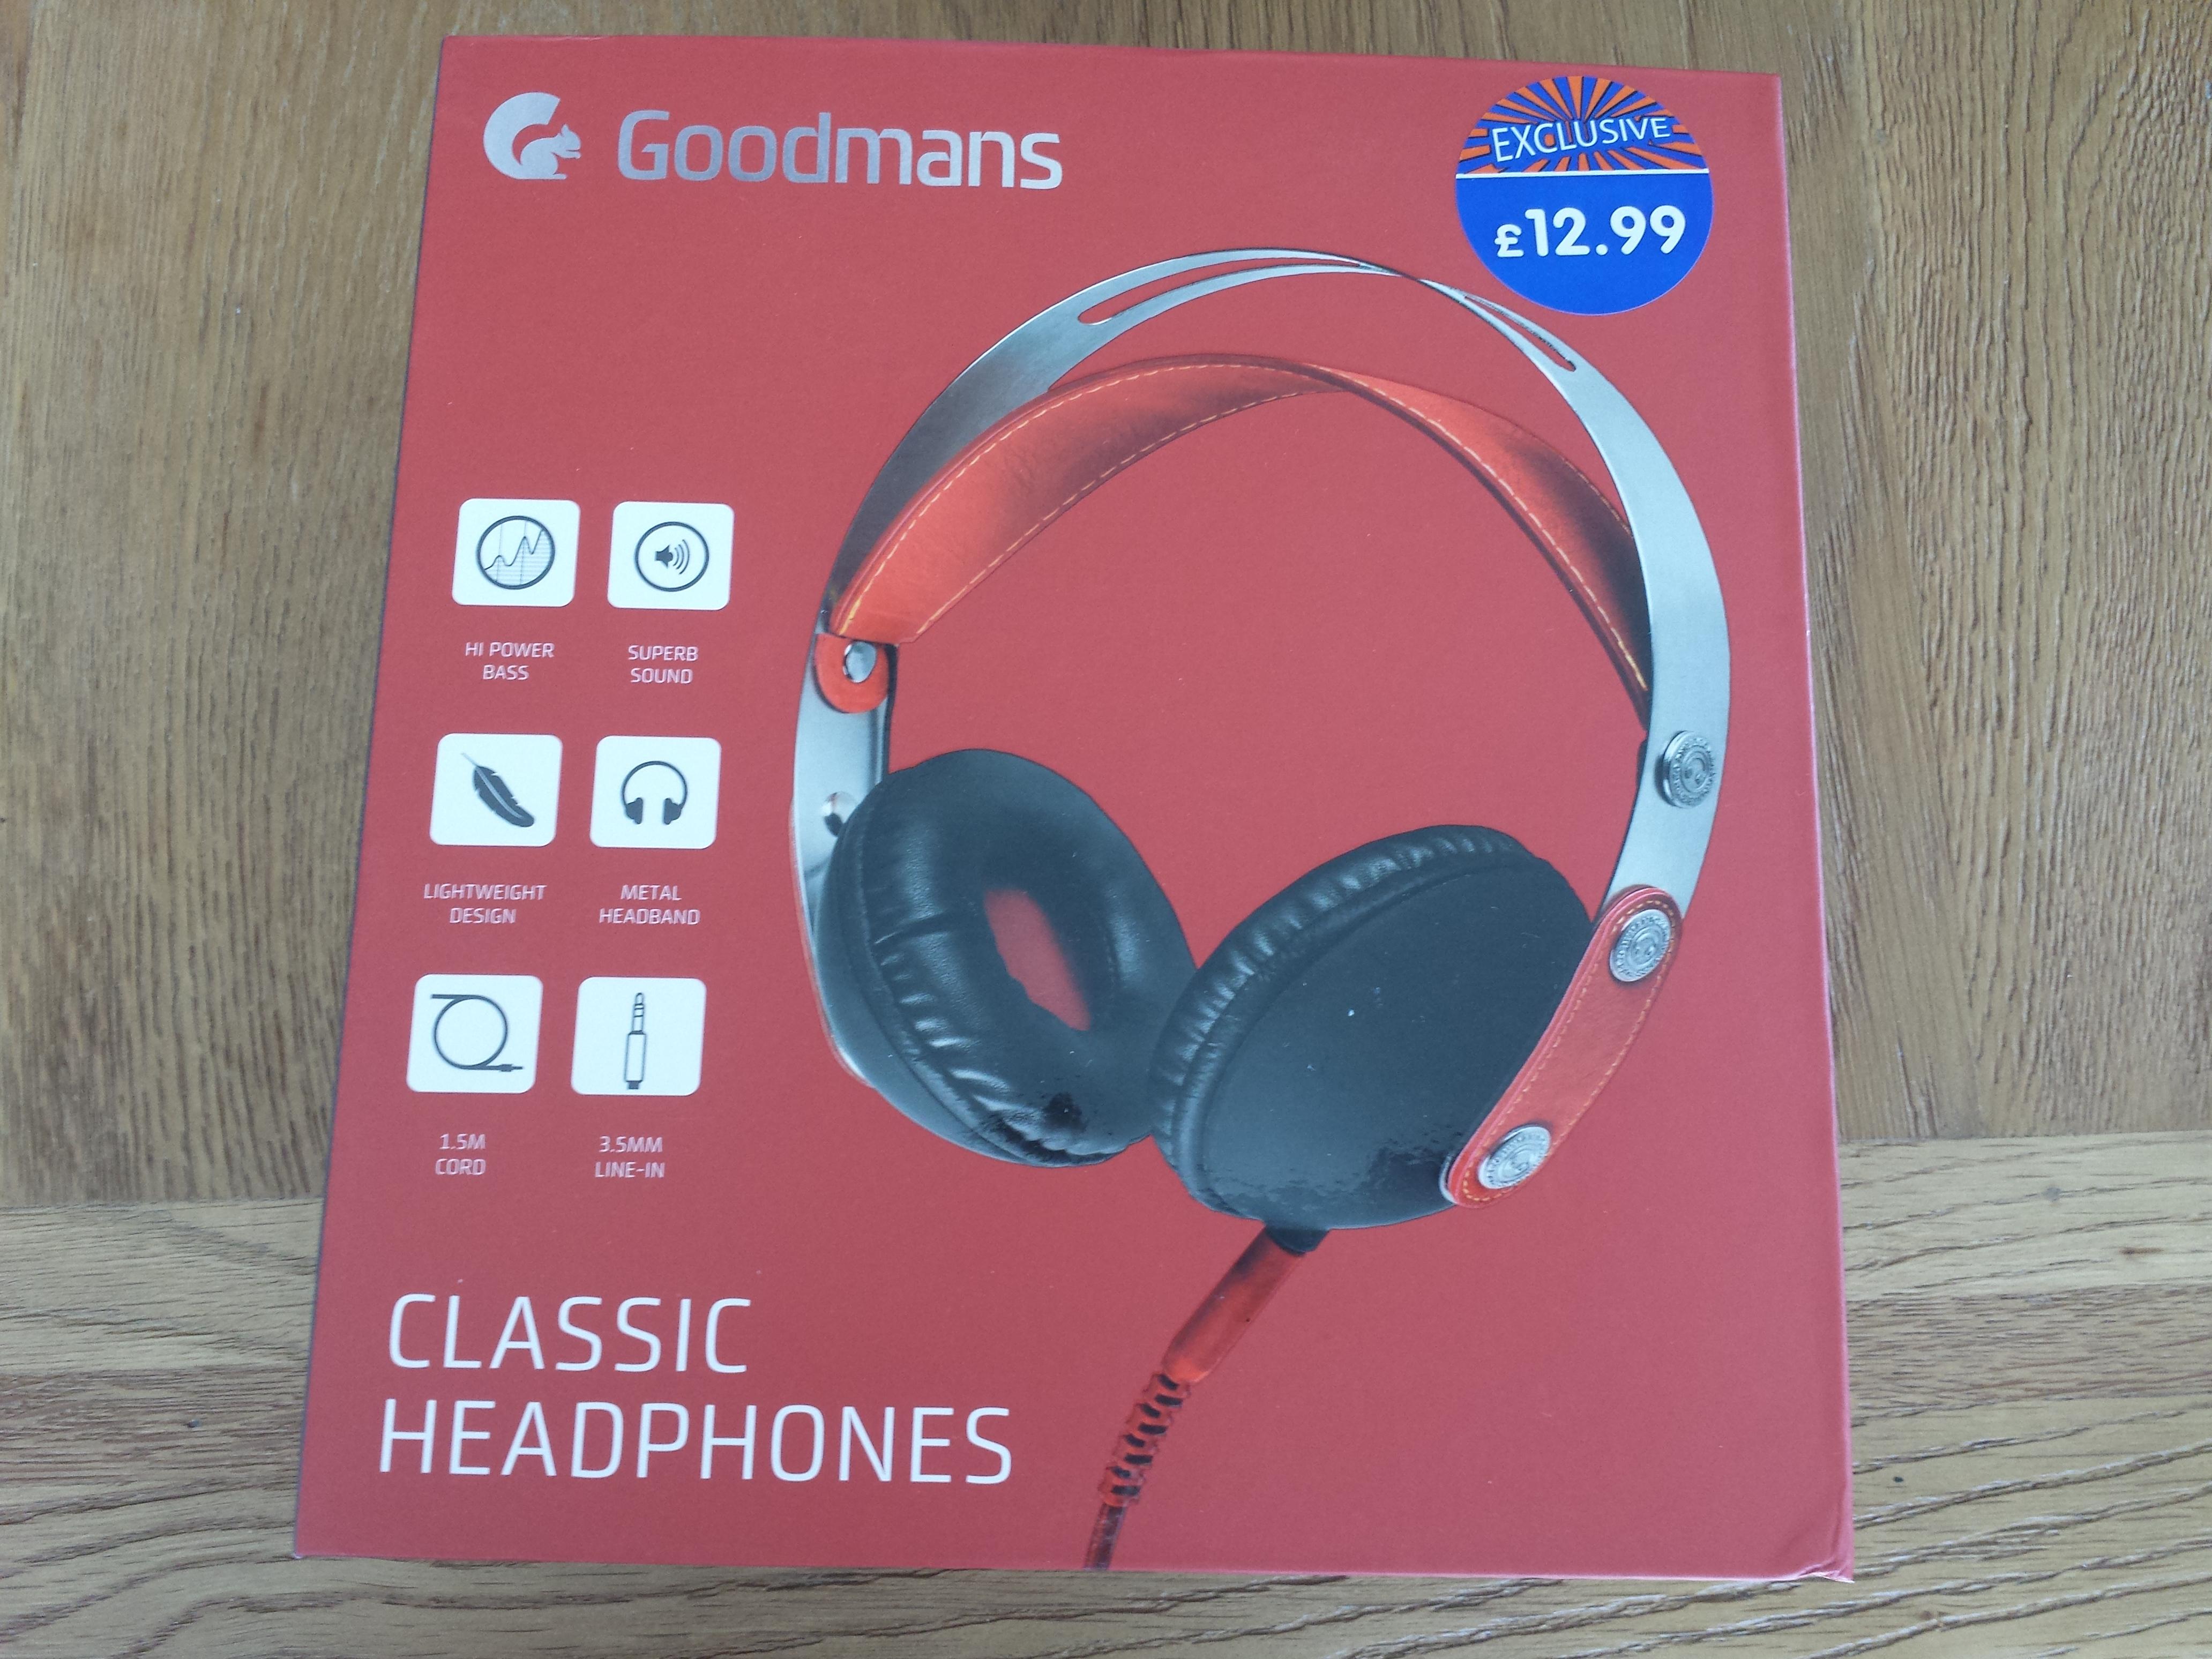 Goodmans Classic Headphones, £5 instore at B&M